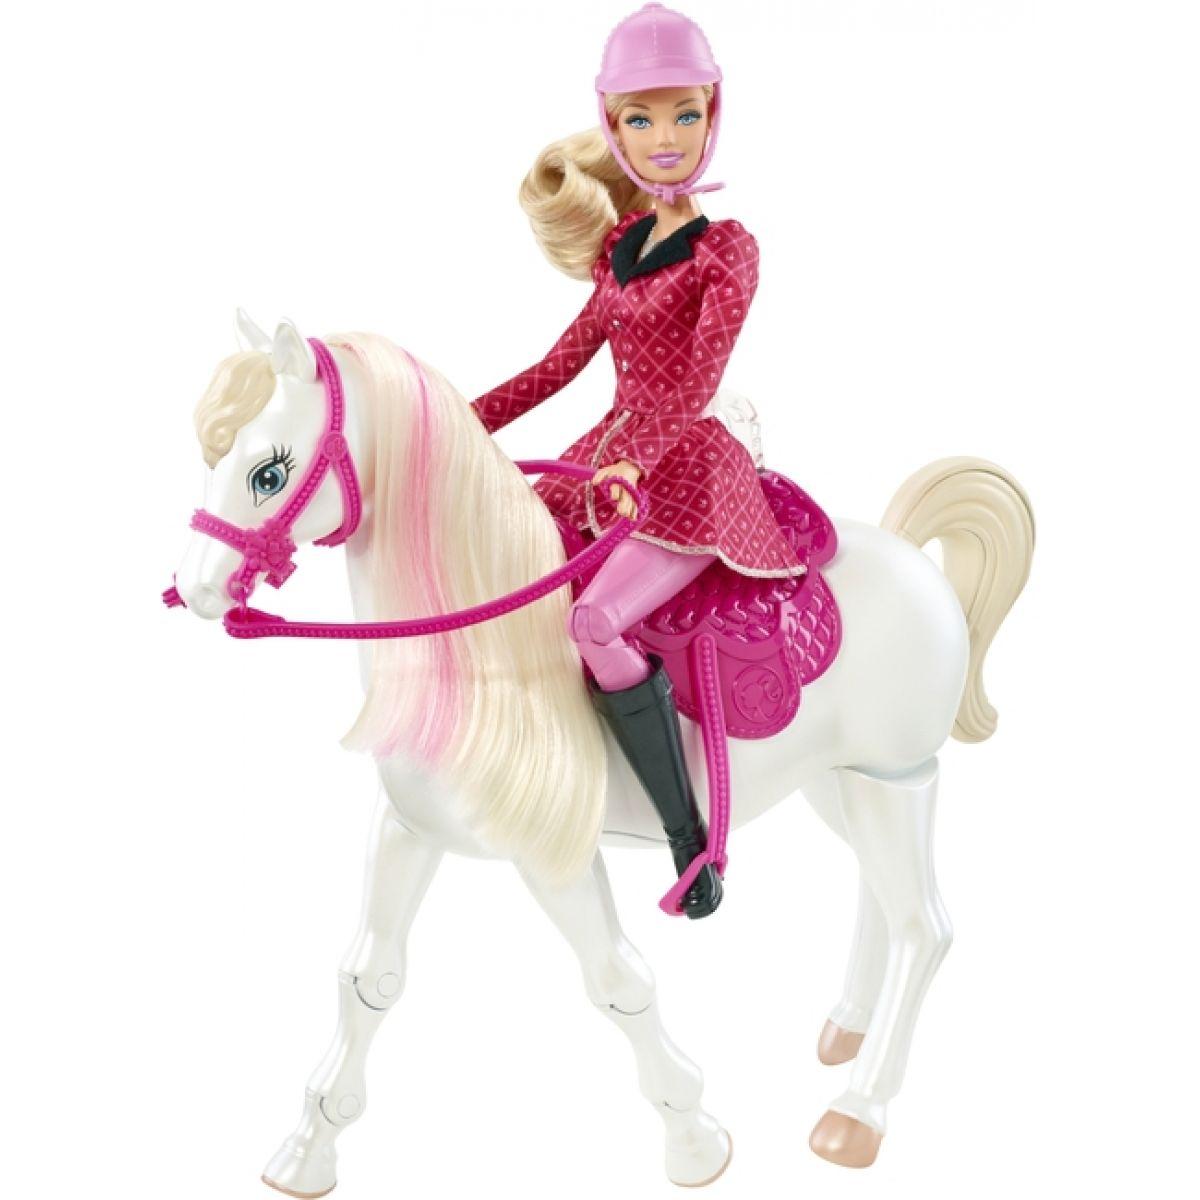 Barbie Panenka a chodící kůň